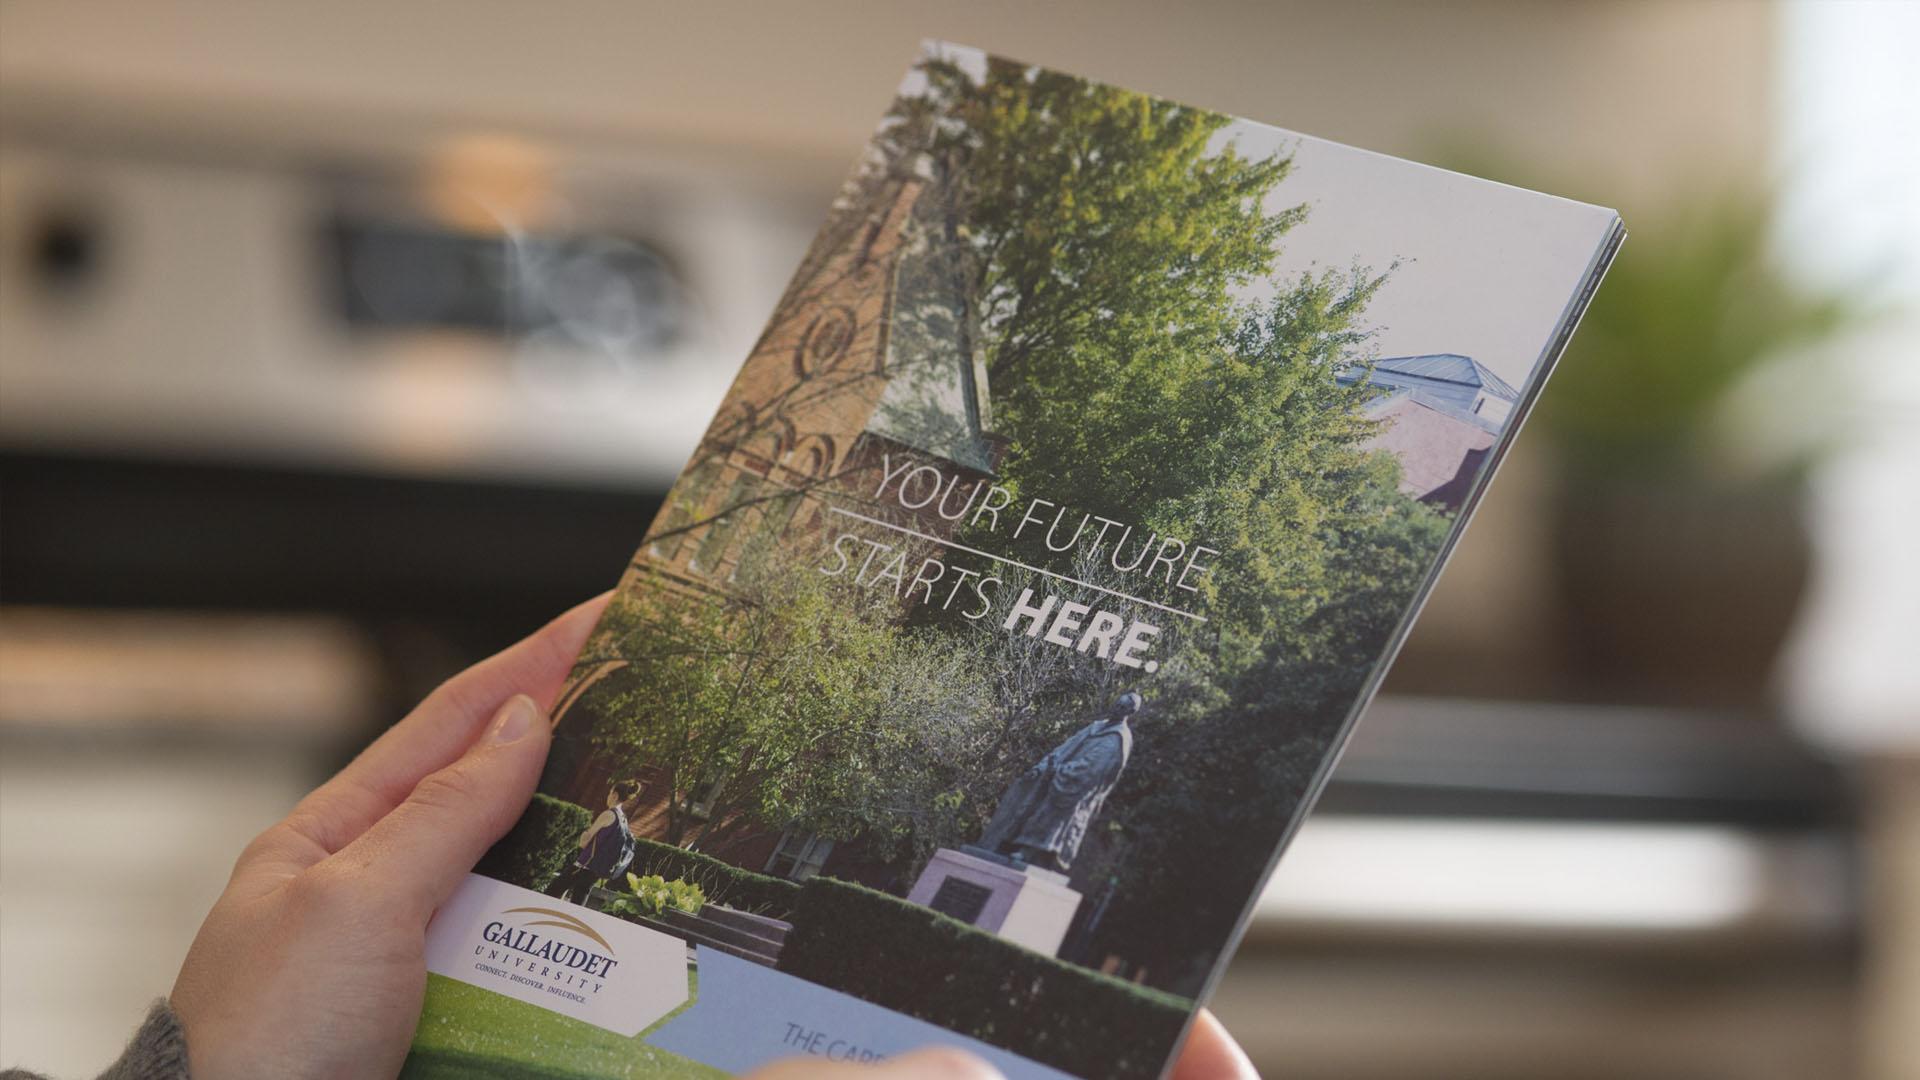 Gallaudet-University-Branding-Marketing-Admissions-Viewbook_06.jpg